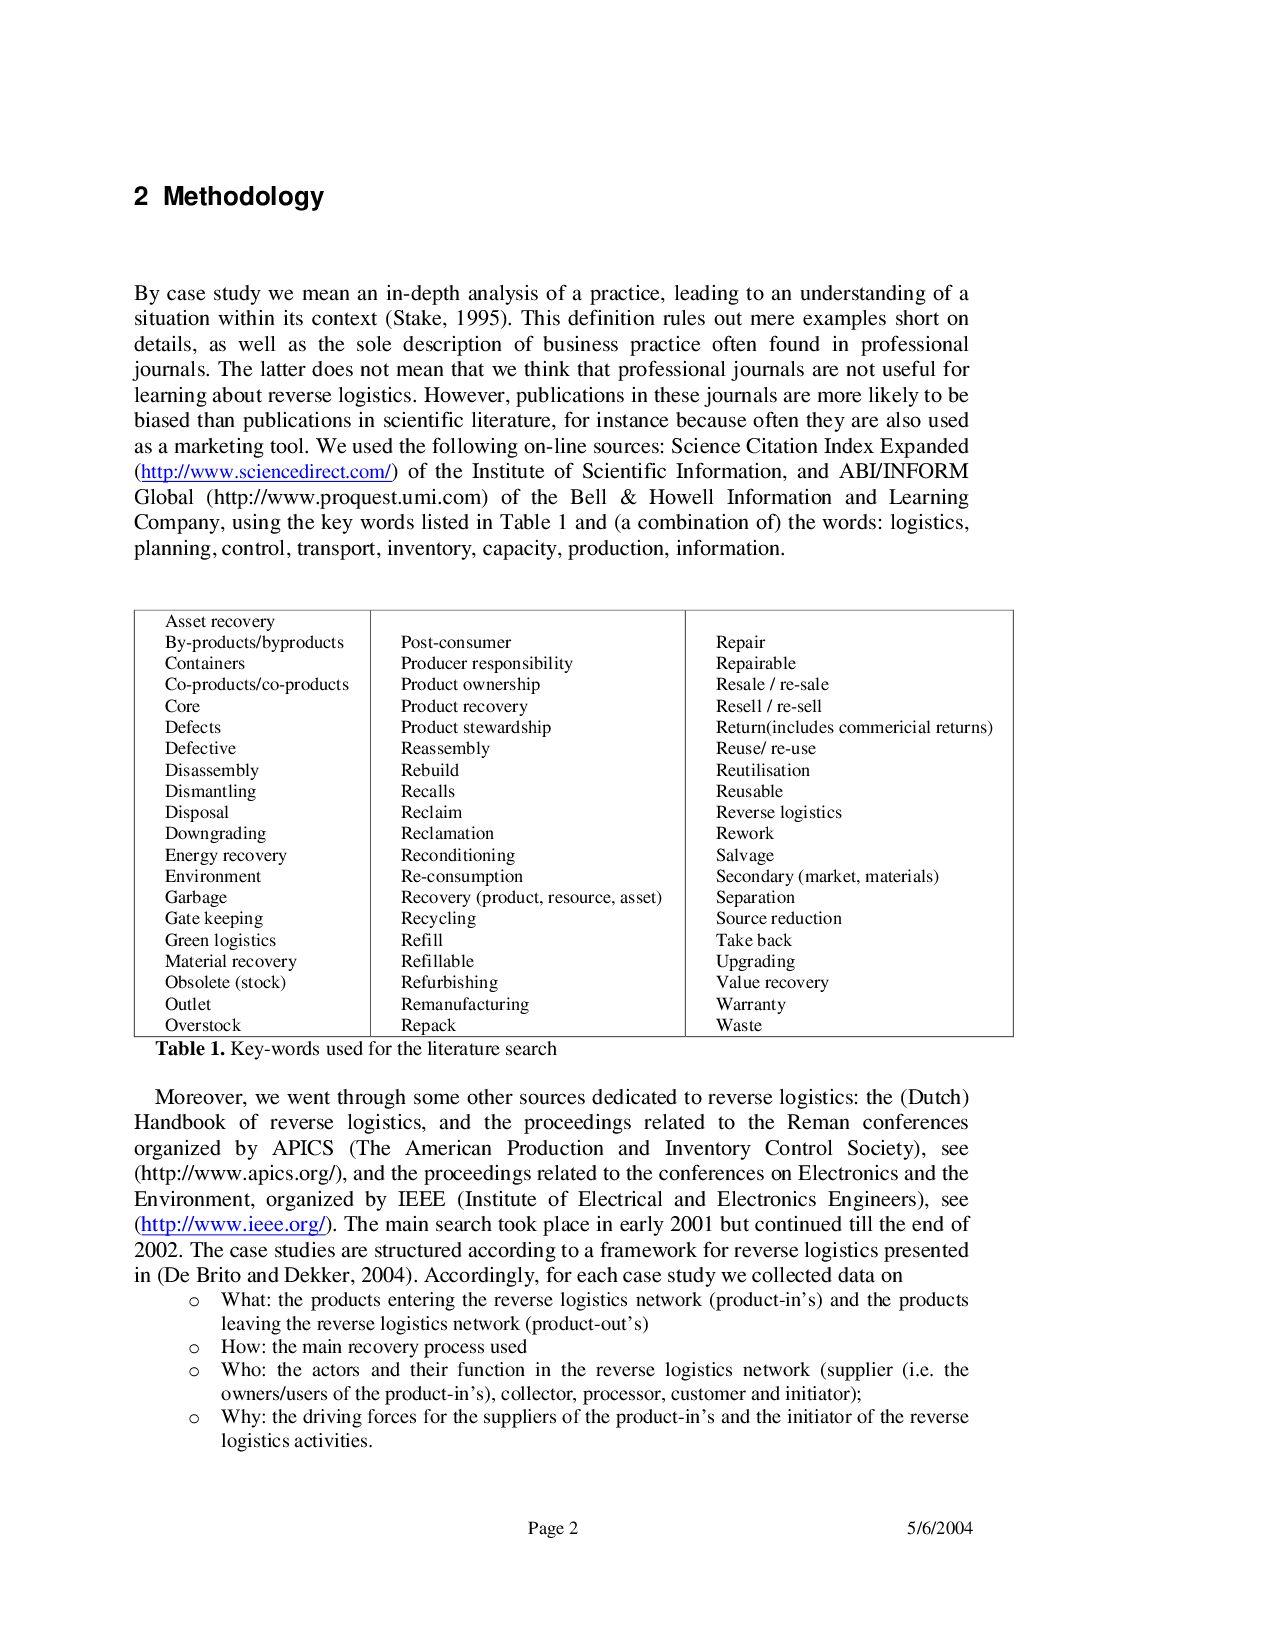 Double space college essay common app